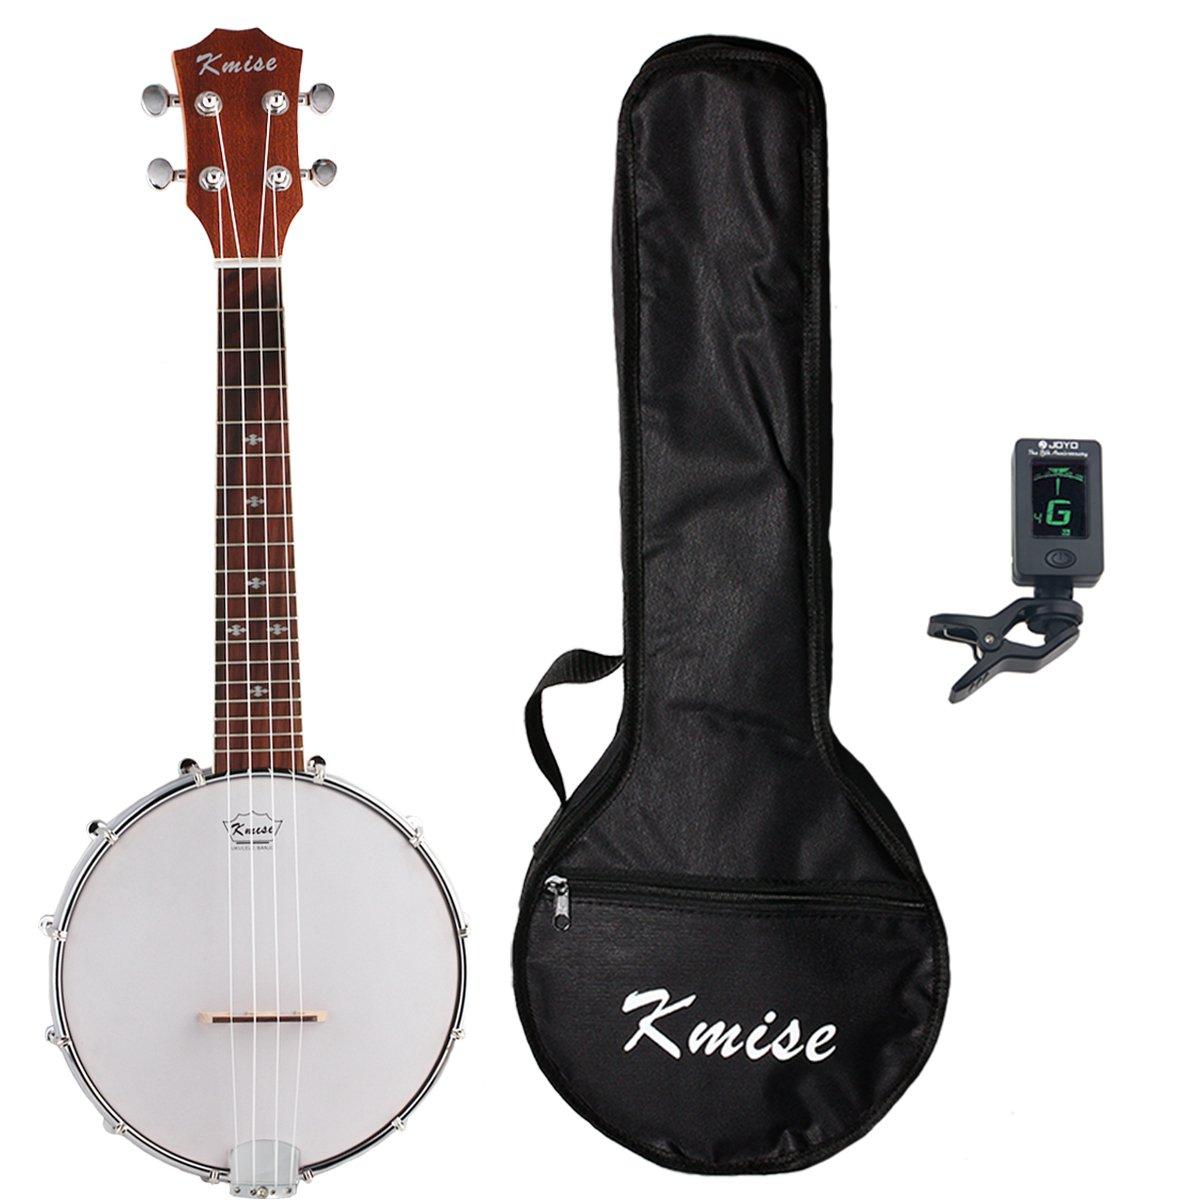 Kmise Banjo Ukulele 4 Saiten Konzert Banjos Sapele Holz Aquila Saiten mit Tasche Tuner Ltd